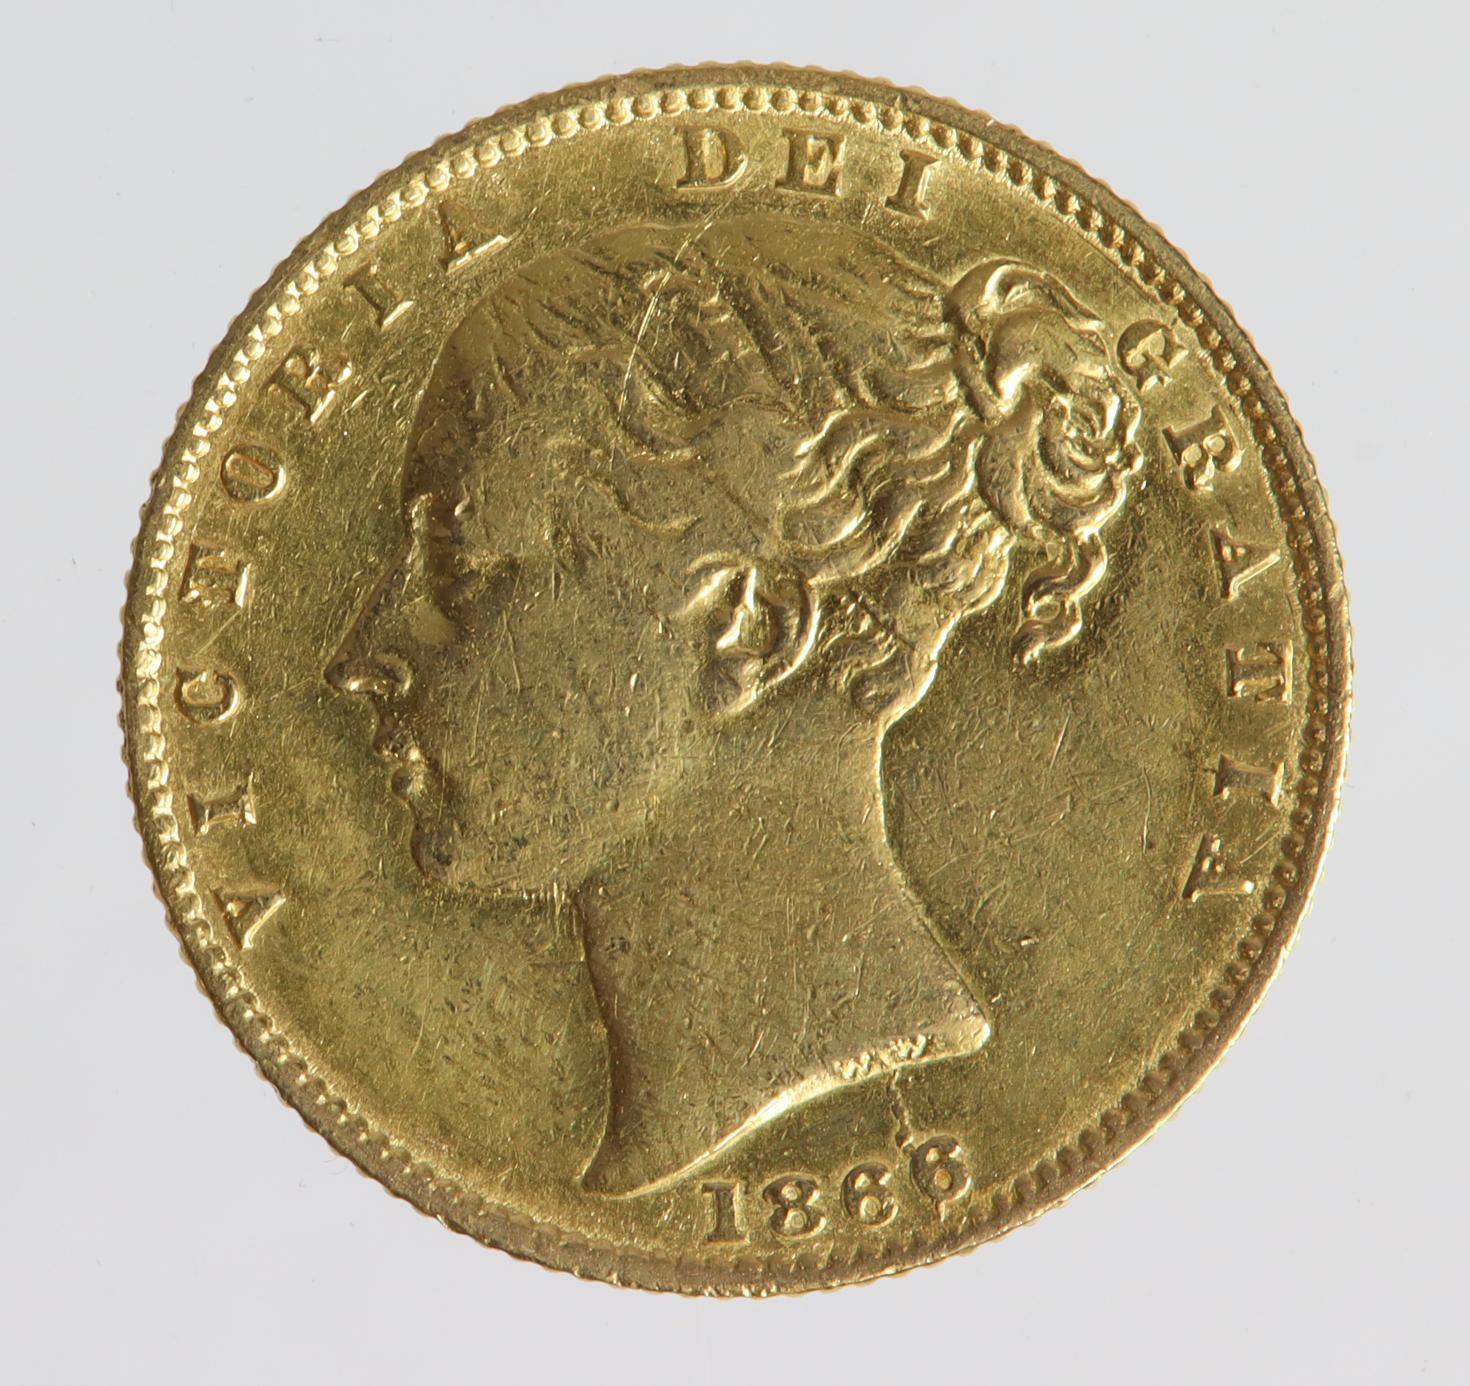 Sovereign 1866 die no. 9, cleaned aVF